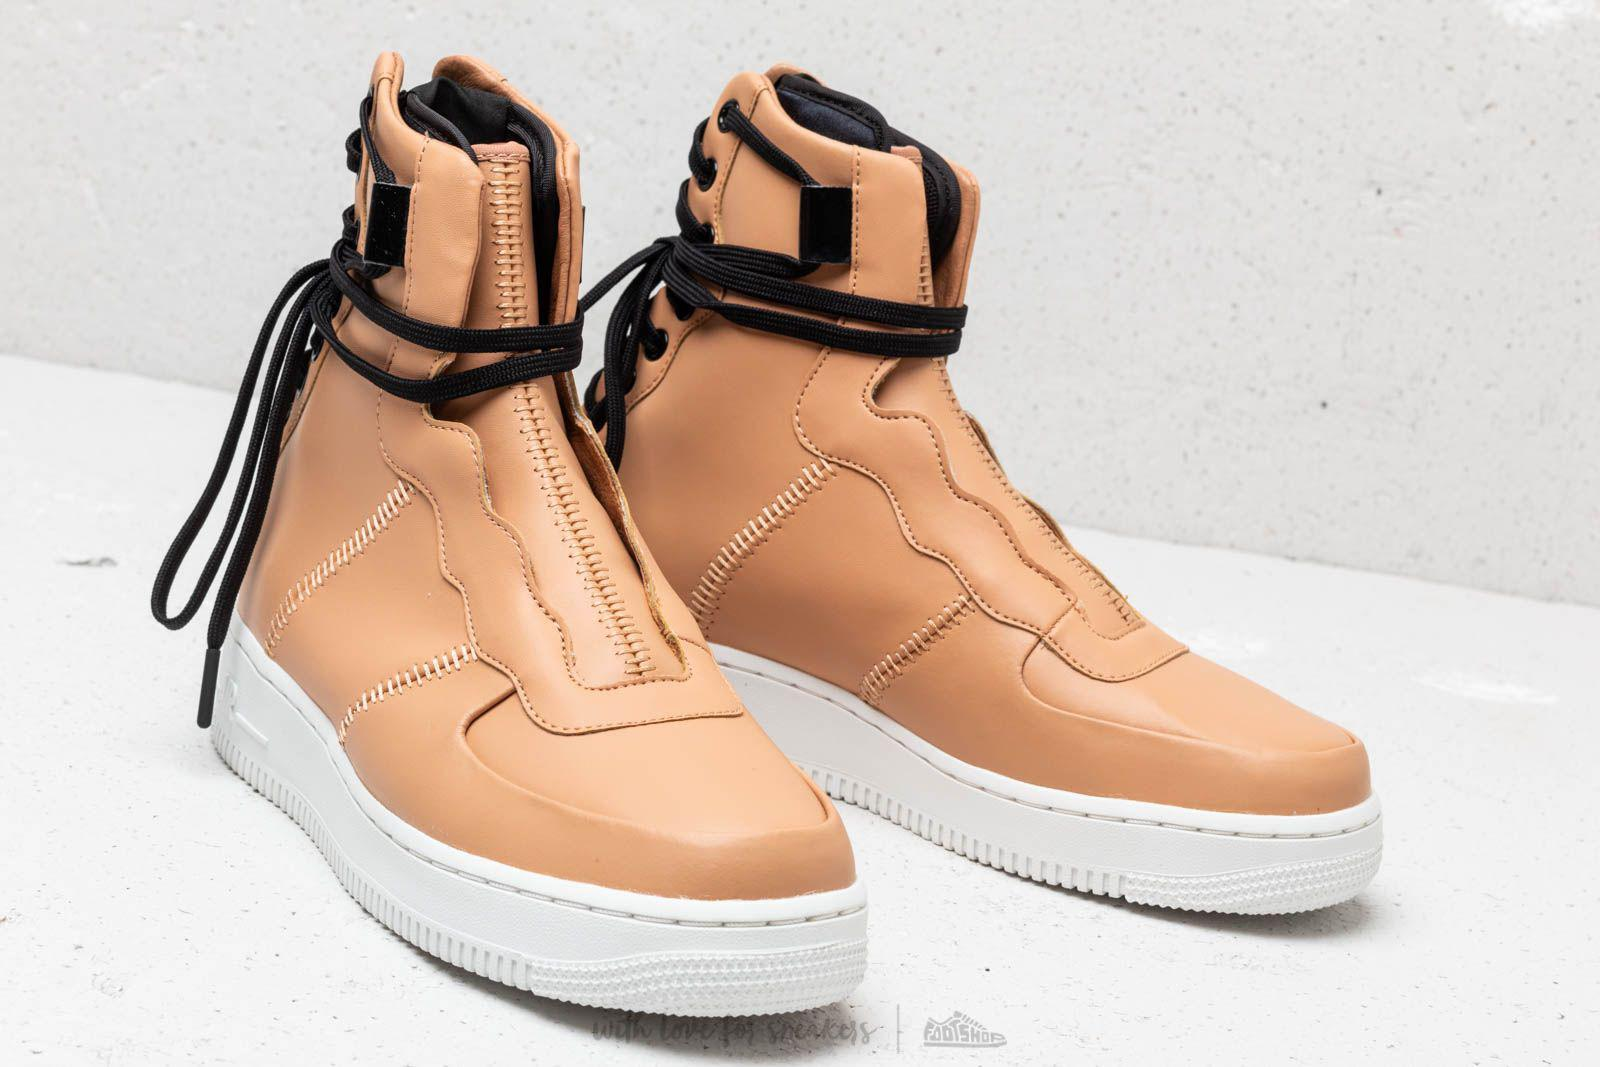 sale retailer 82522 a59de Lyst - Nike Wmns Air Force 1 Rebel Xx Praline  Black Summit  White